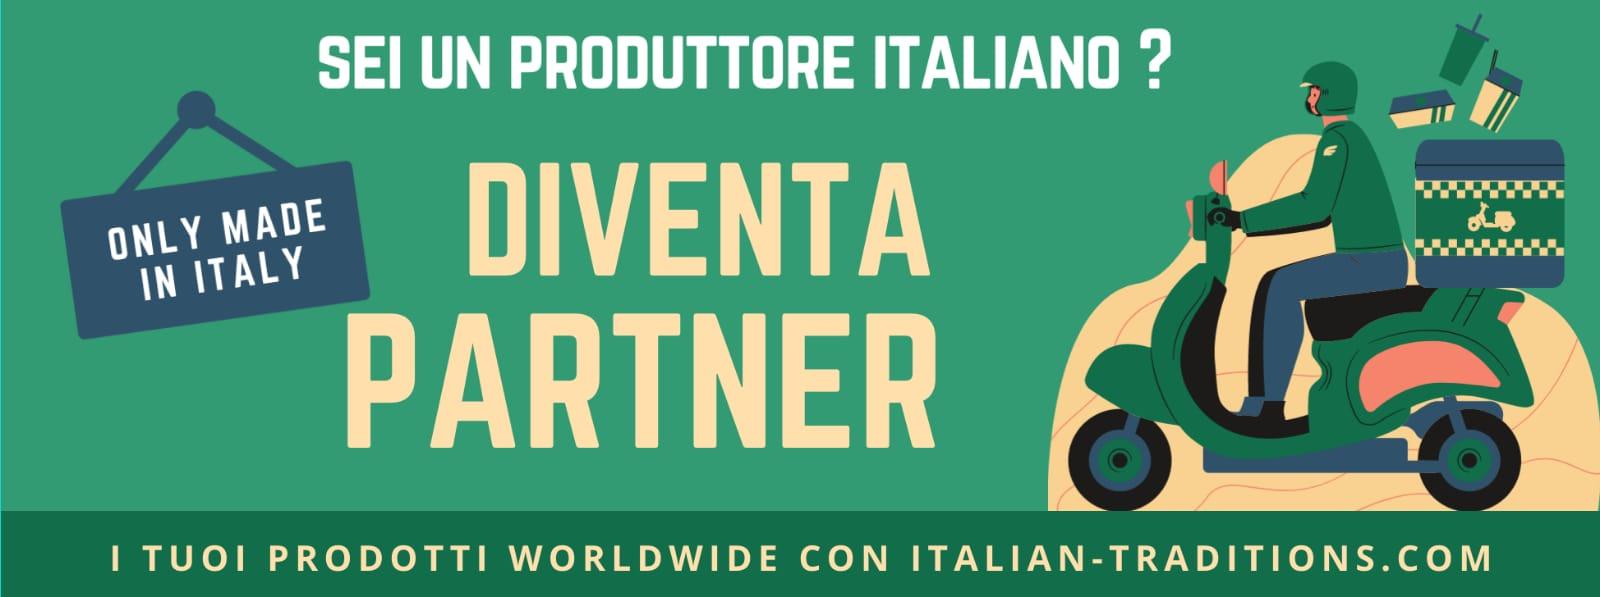 bannerpartner-italiantraditions